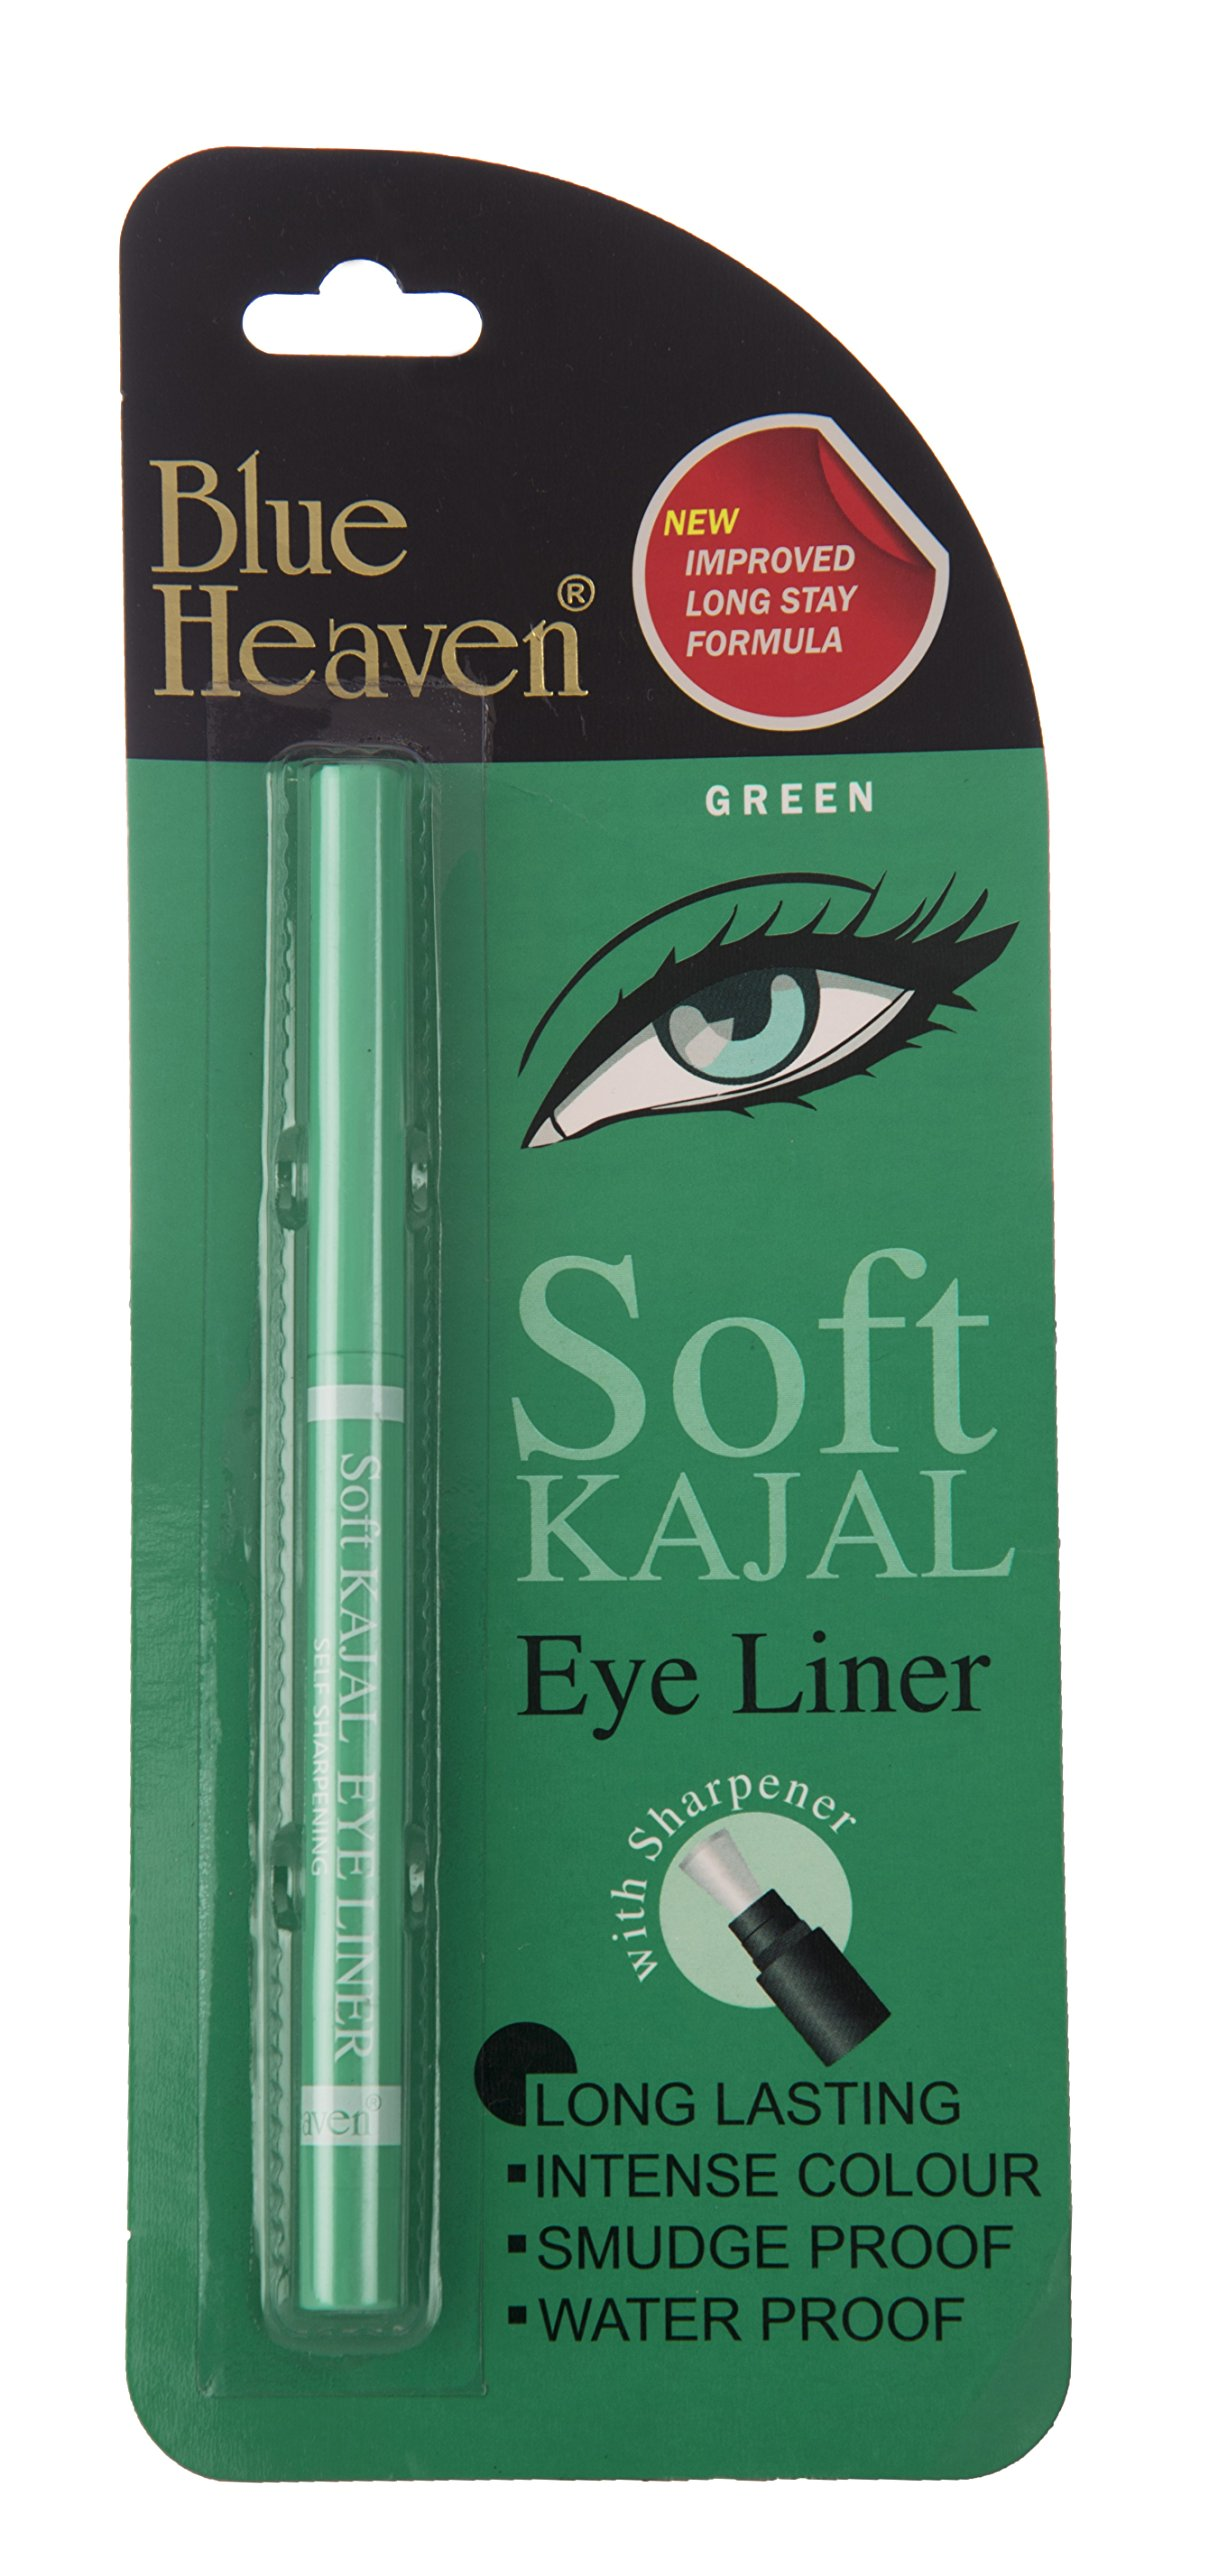 Blue Heaven Soft Kajal Eyeliner, Green, 0.31g product image